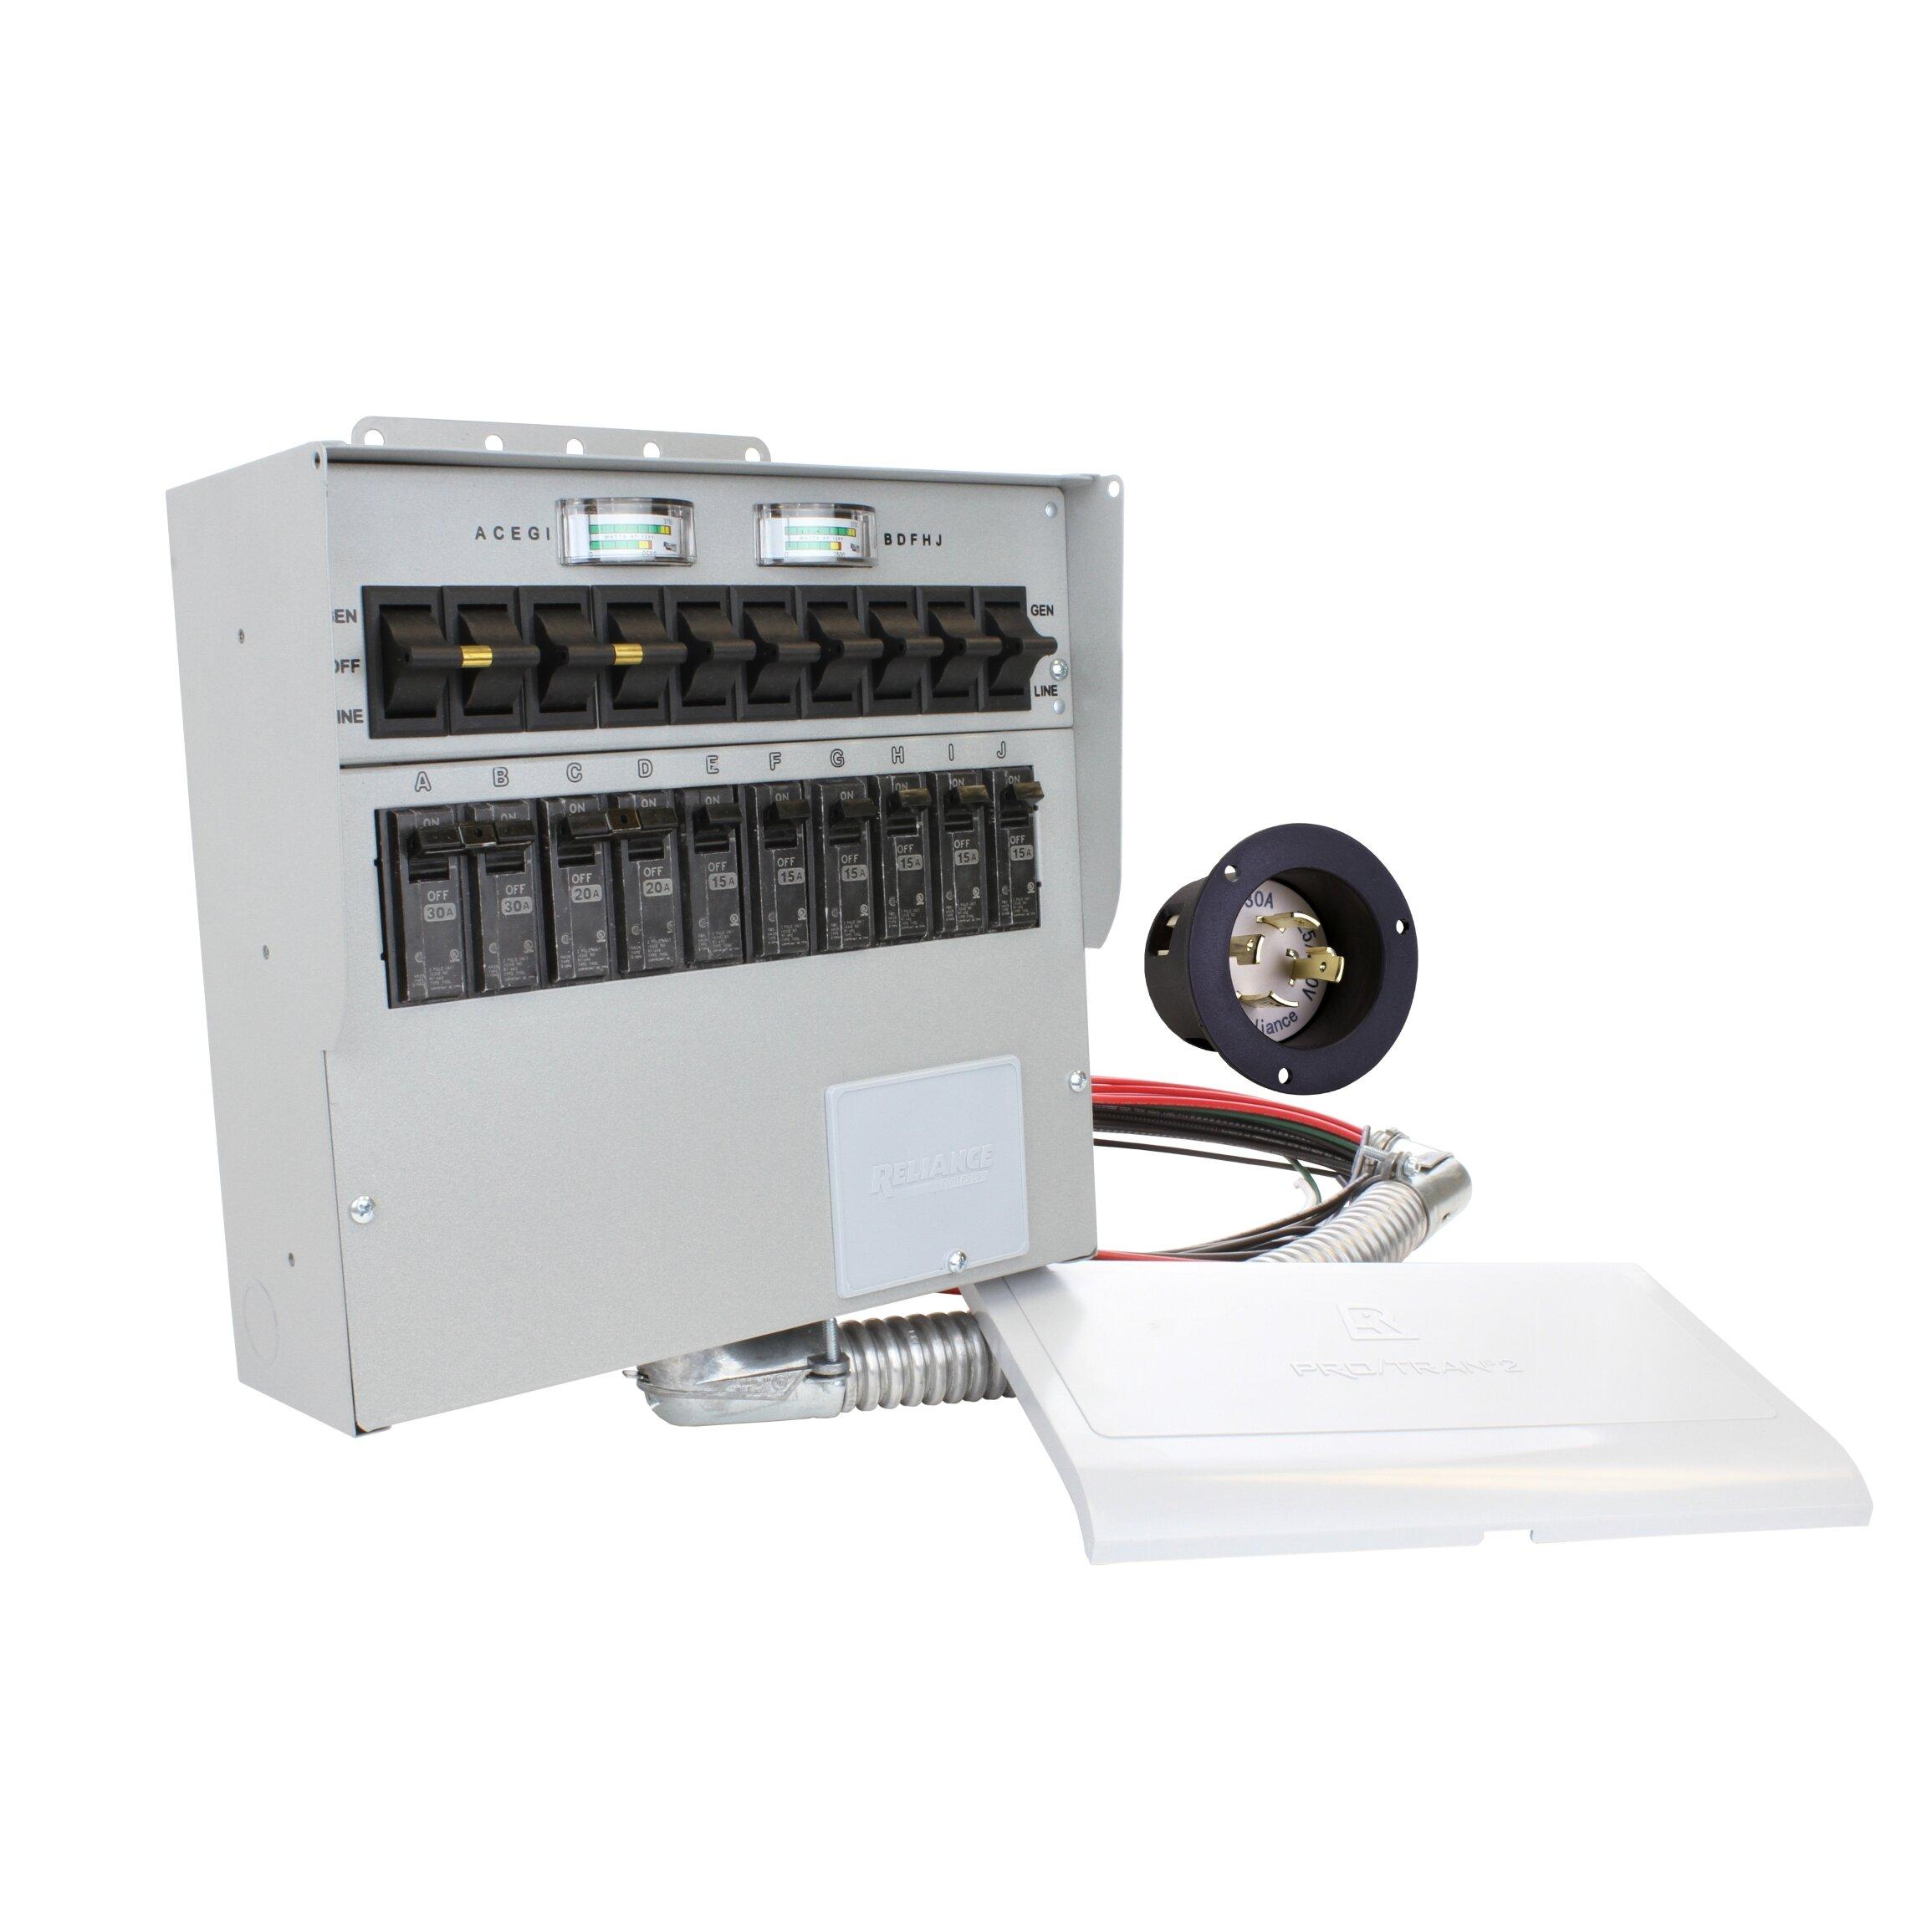 Reliance Controls Pro/Tran 30-Amp 10-Circuit 2 Manual Transfer Switch